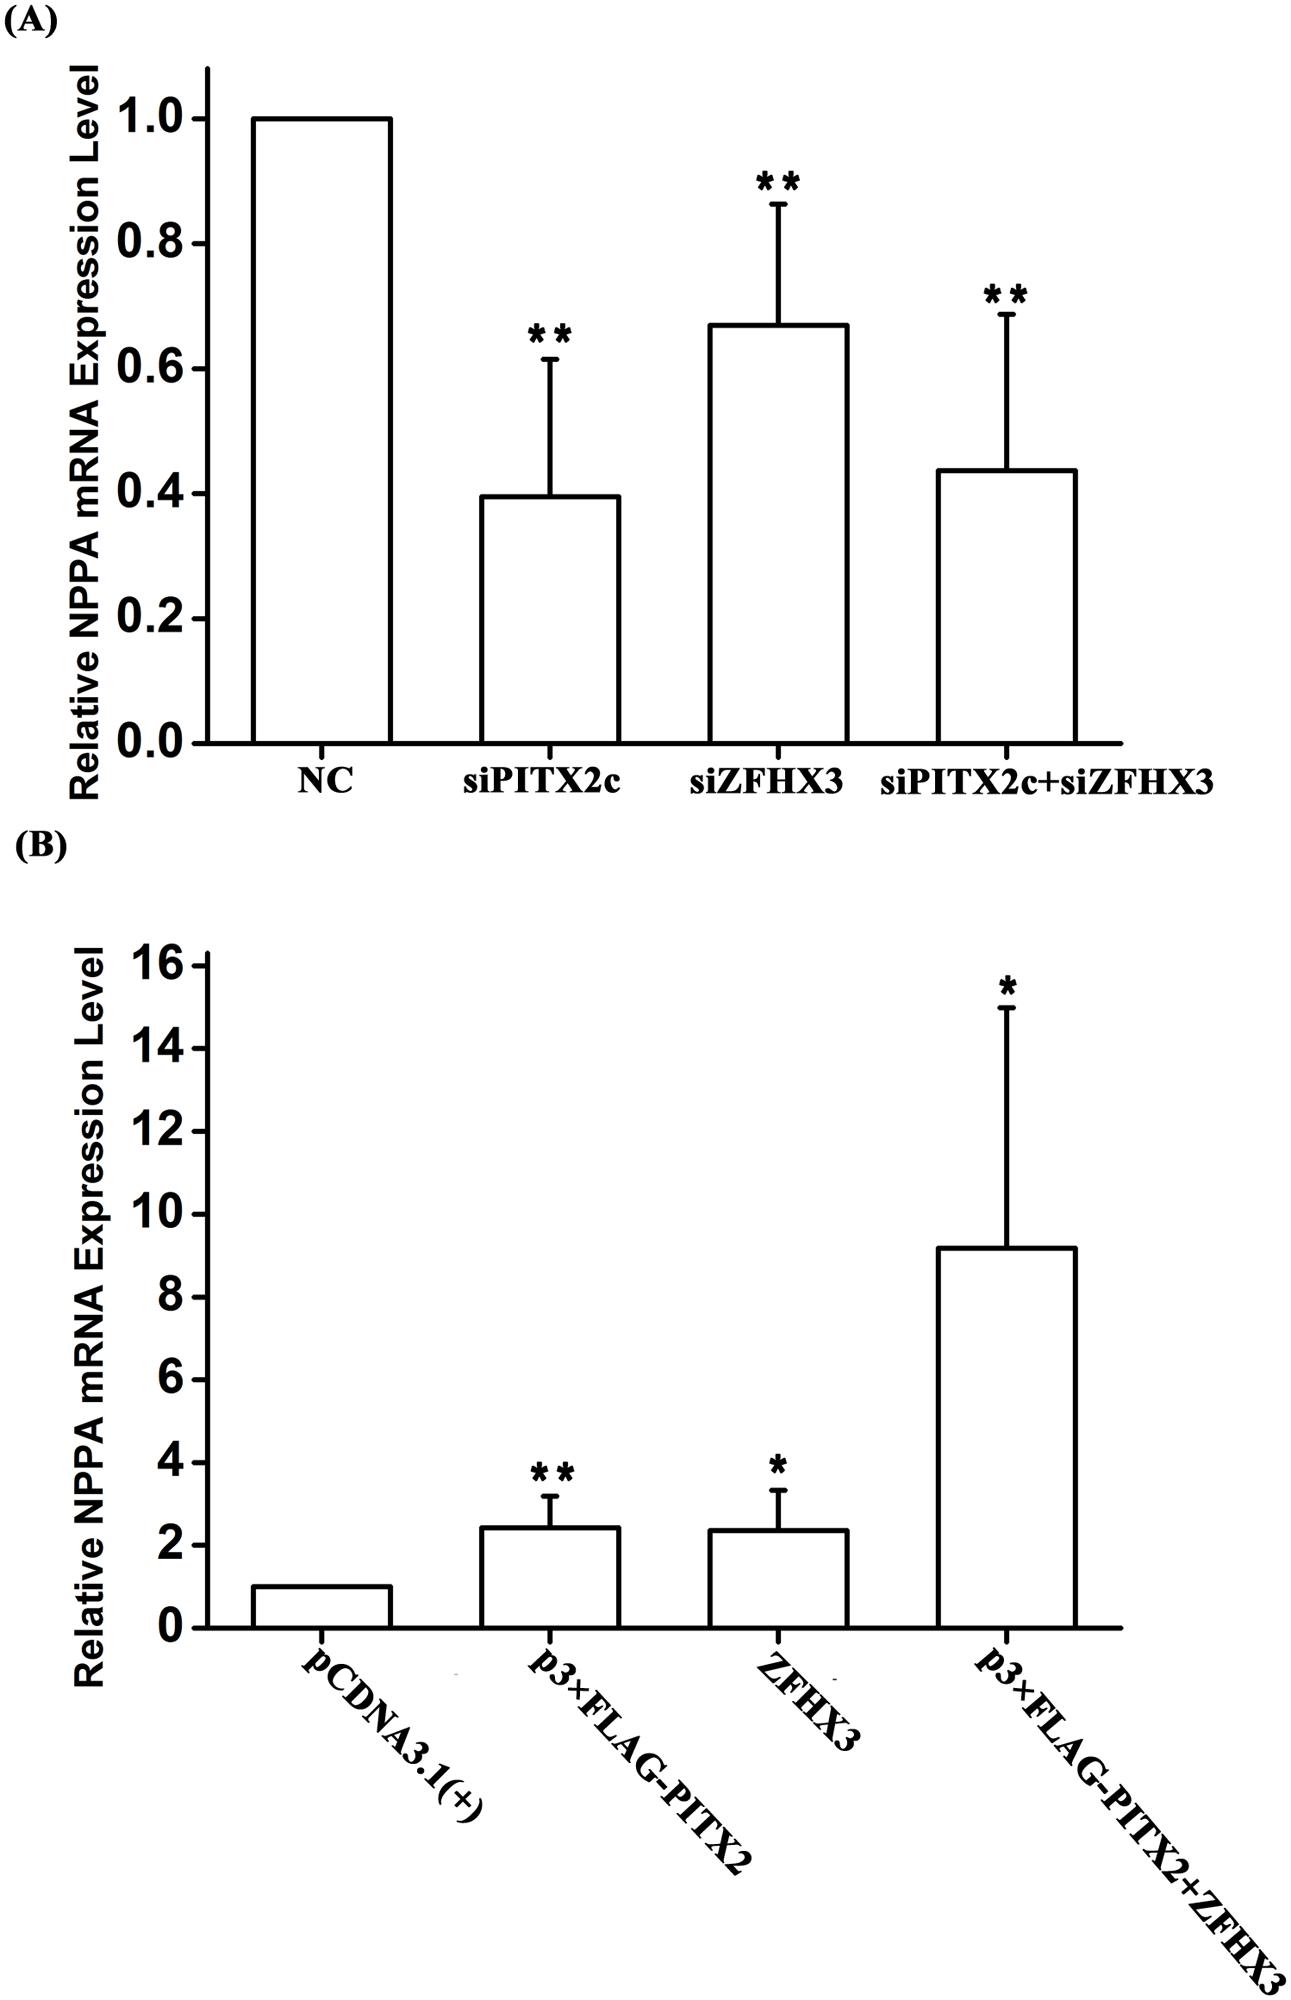 Both <i>PITX2c</i> and <i>ZFHX3</i> positively regulate expression of the <i>NPPA</i> transcription.